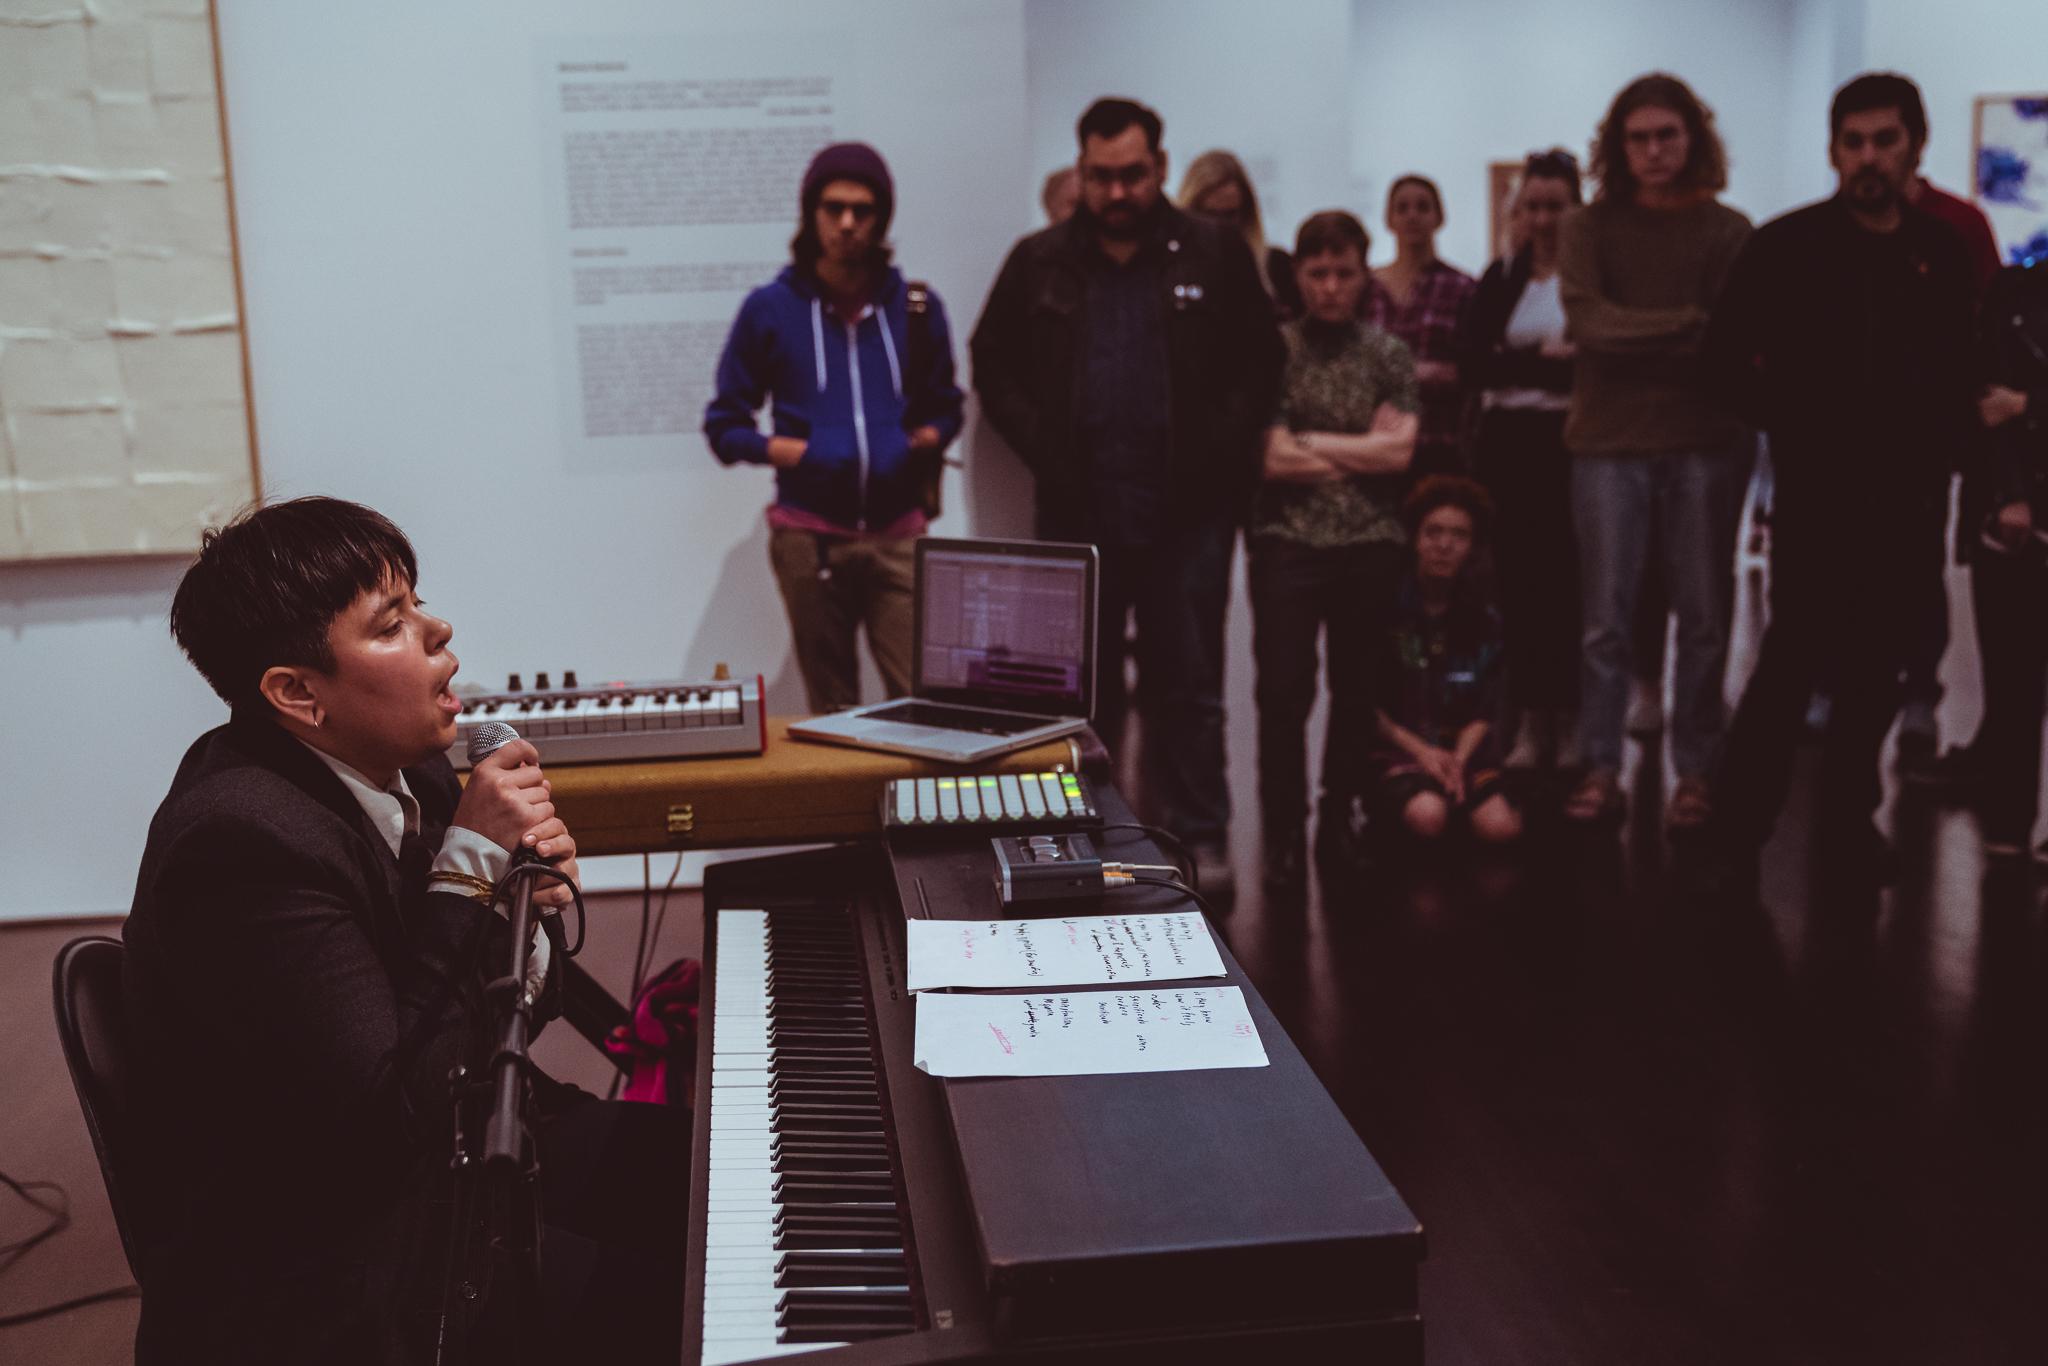 012818-SoundSpaceFeedback-BlantonMuseum-001.jpg